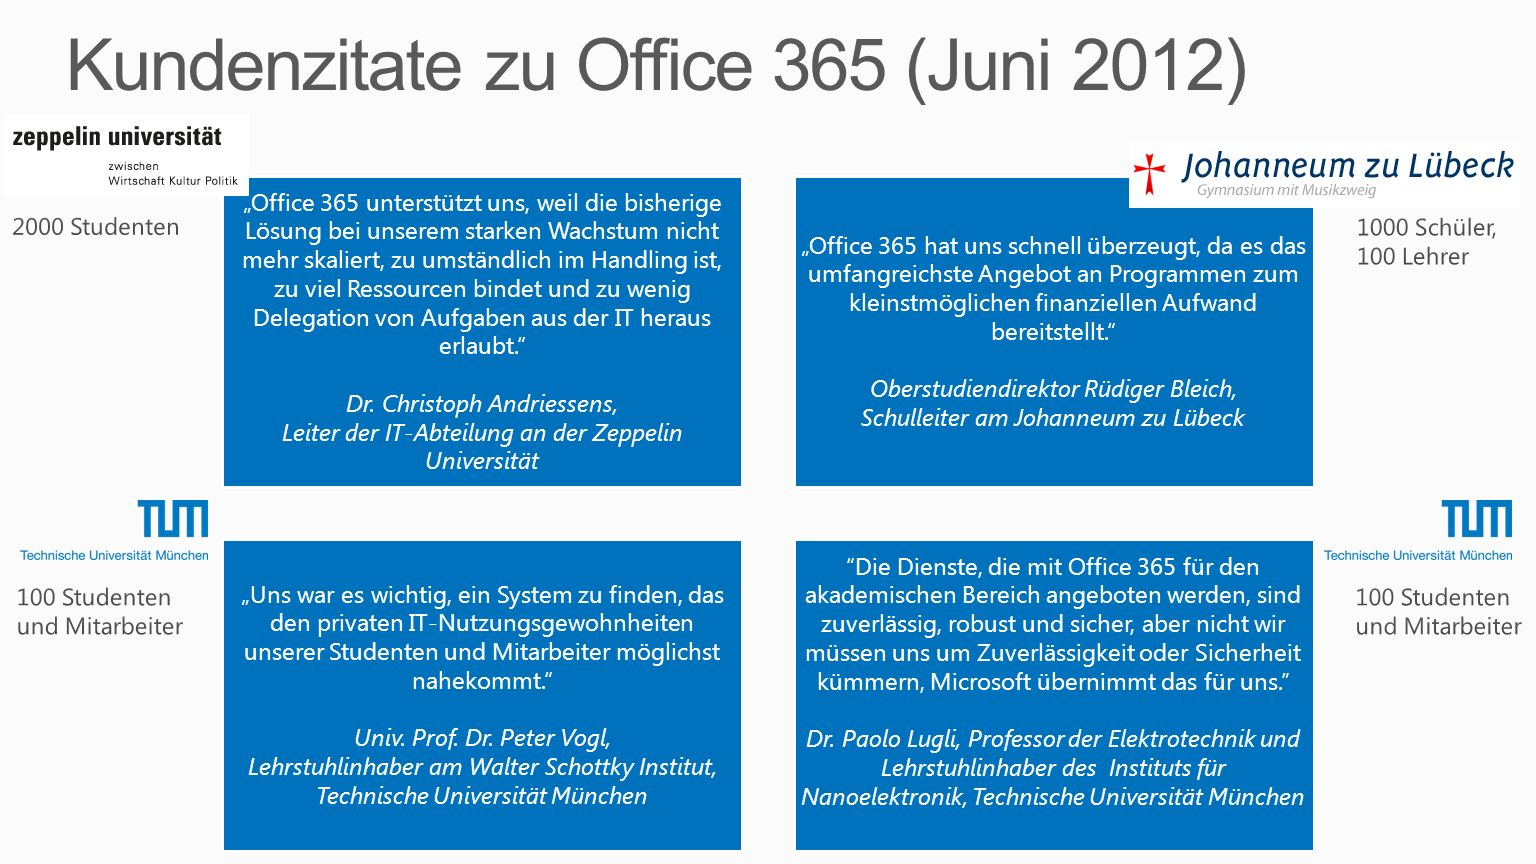 Kundenzitate zu Office 365 (Juni 2012)